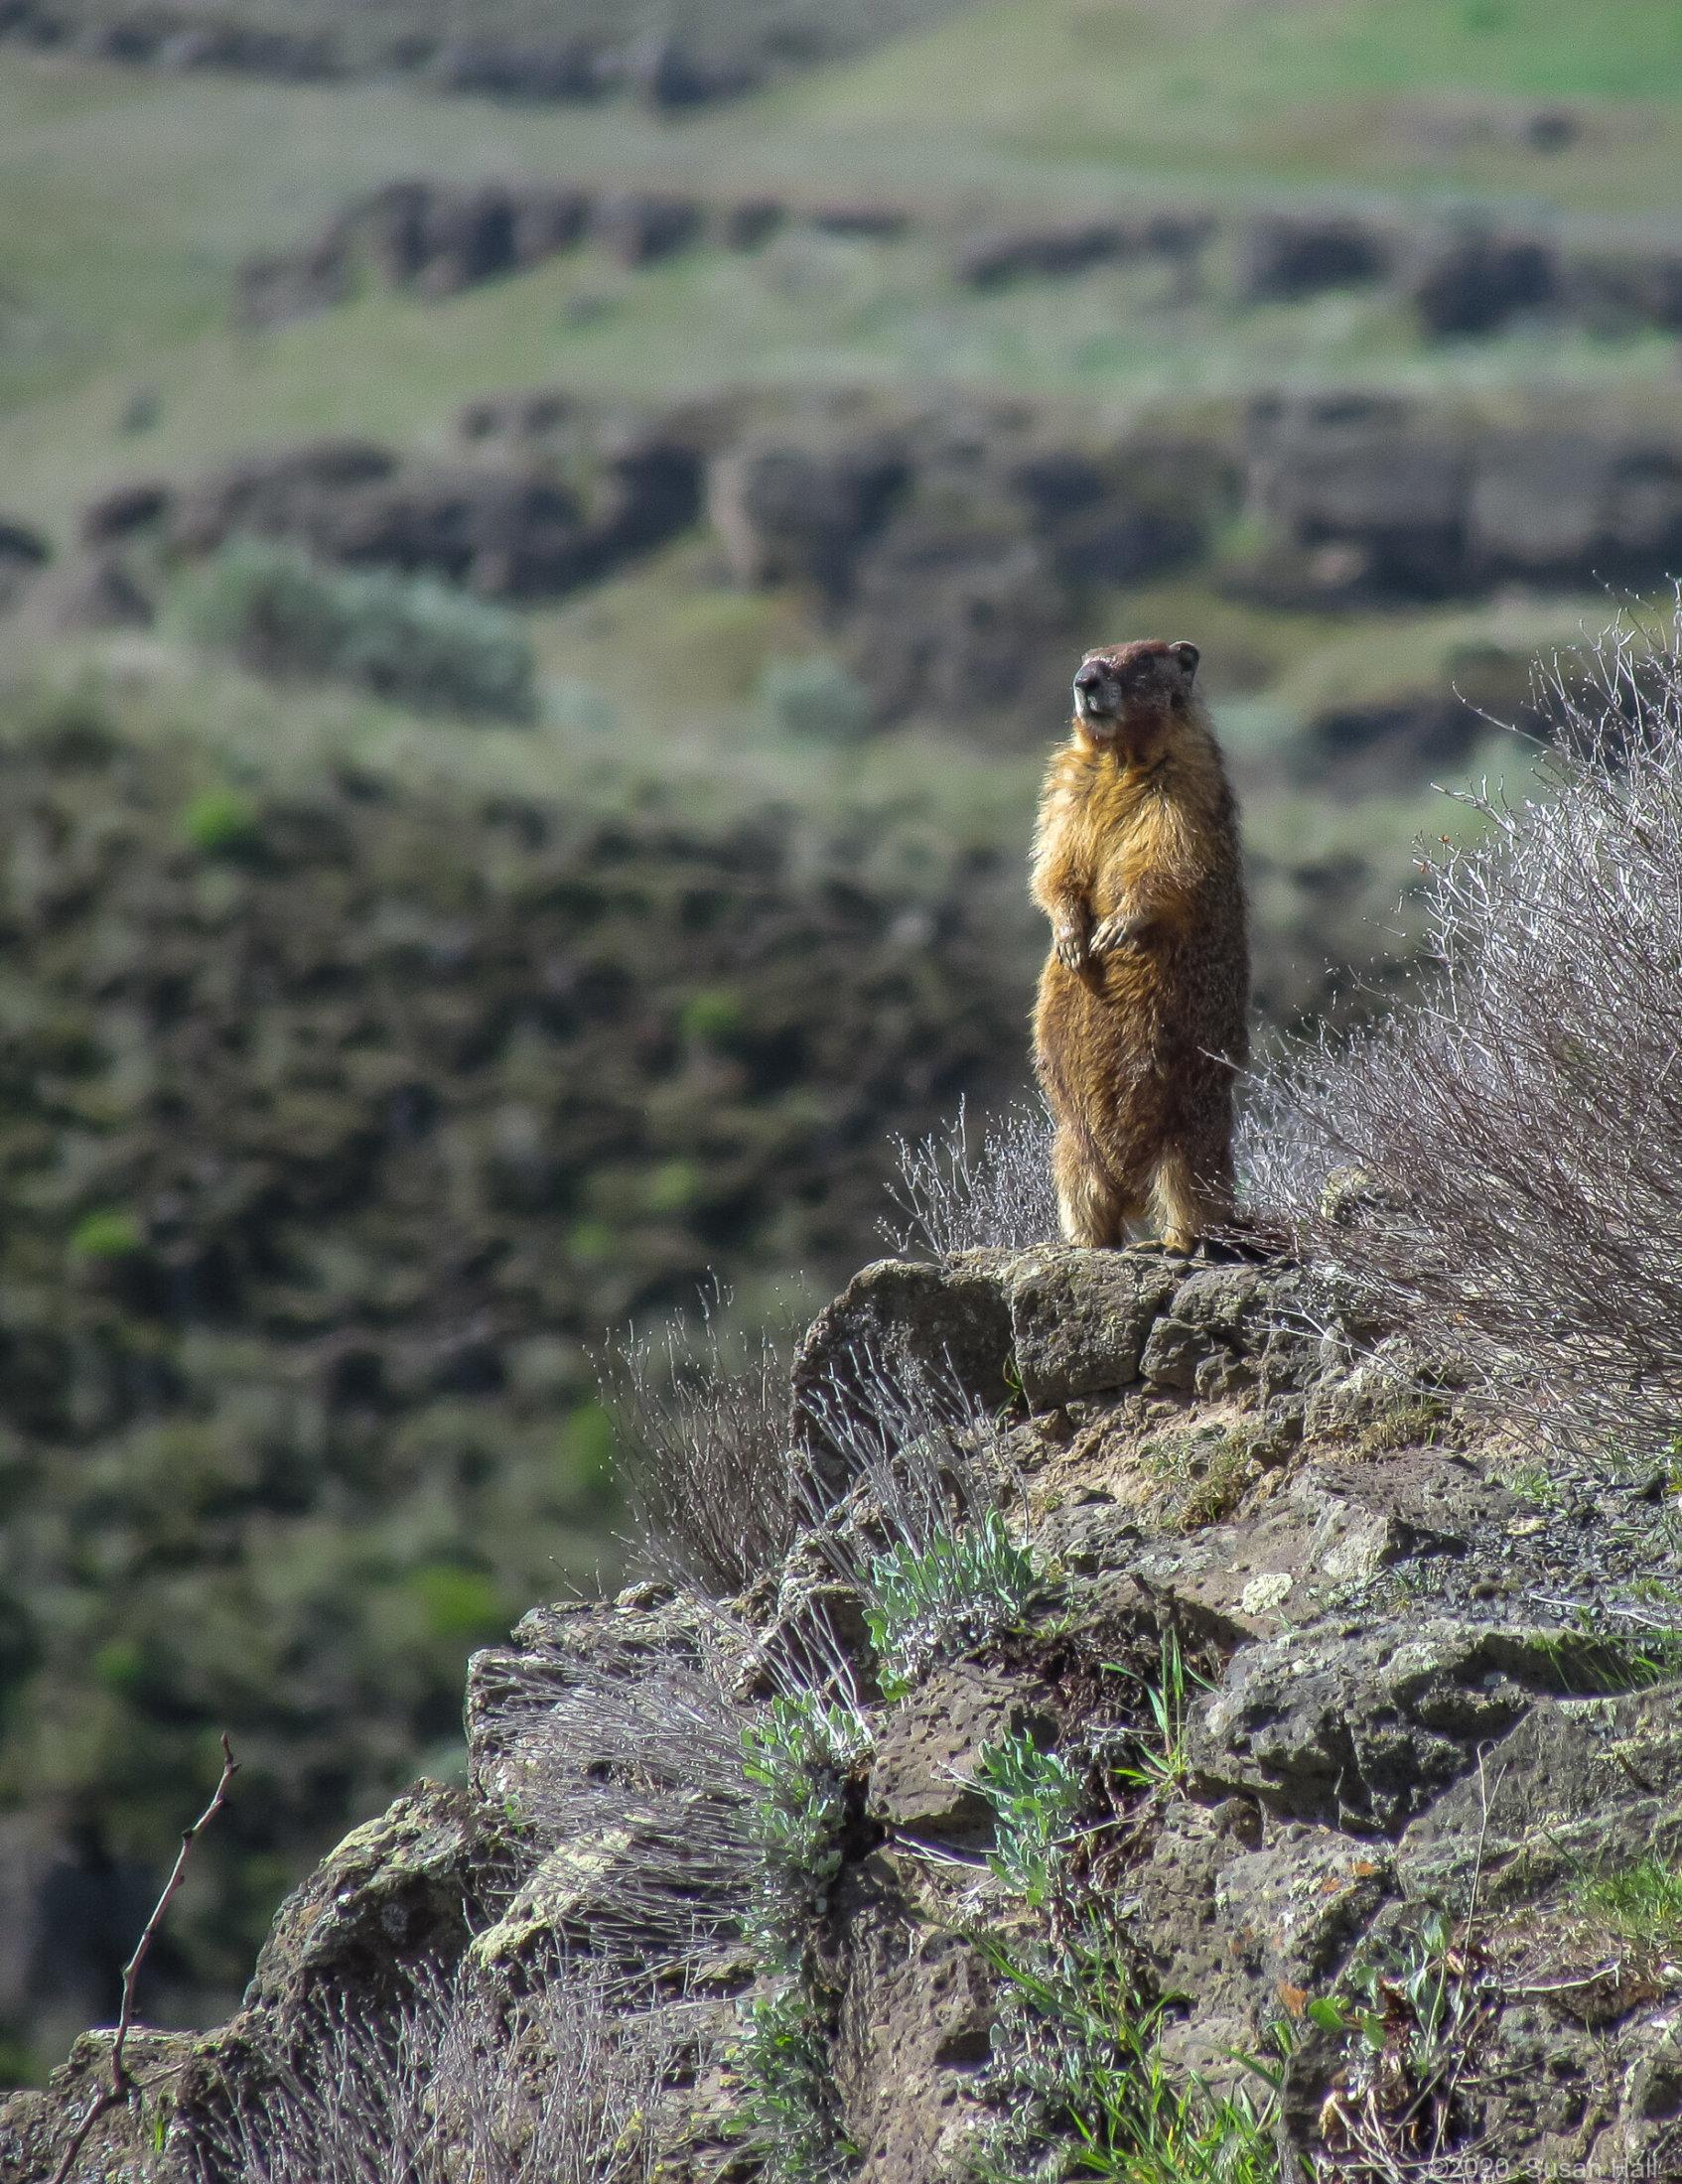 Marmot stands guard duty